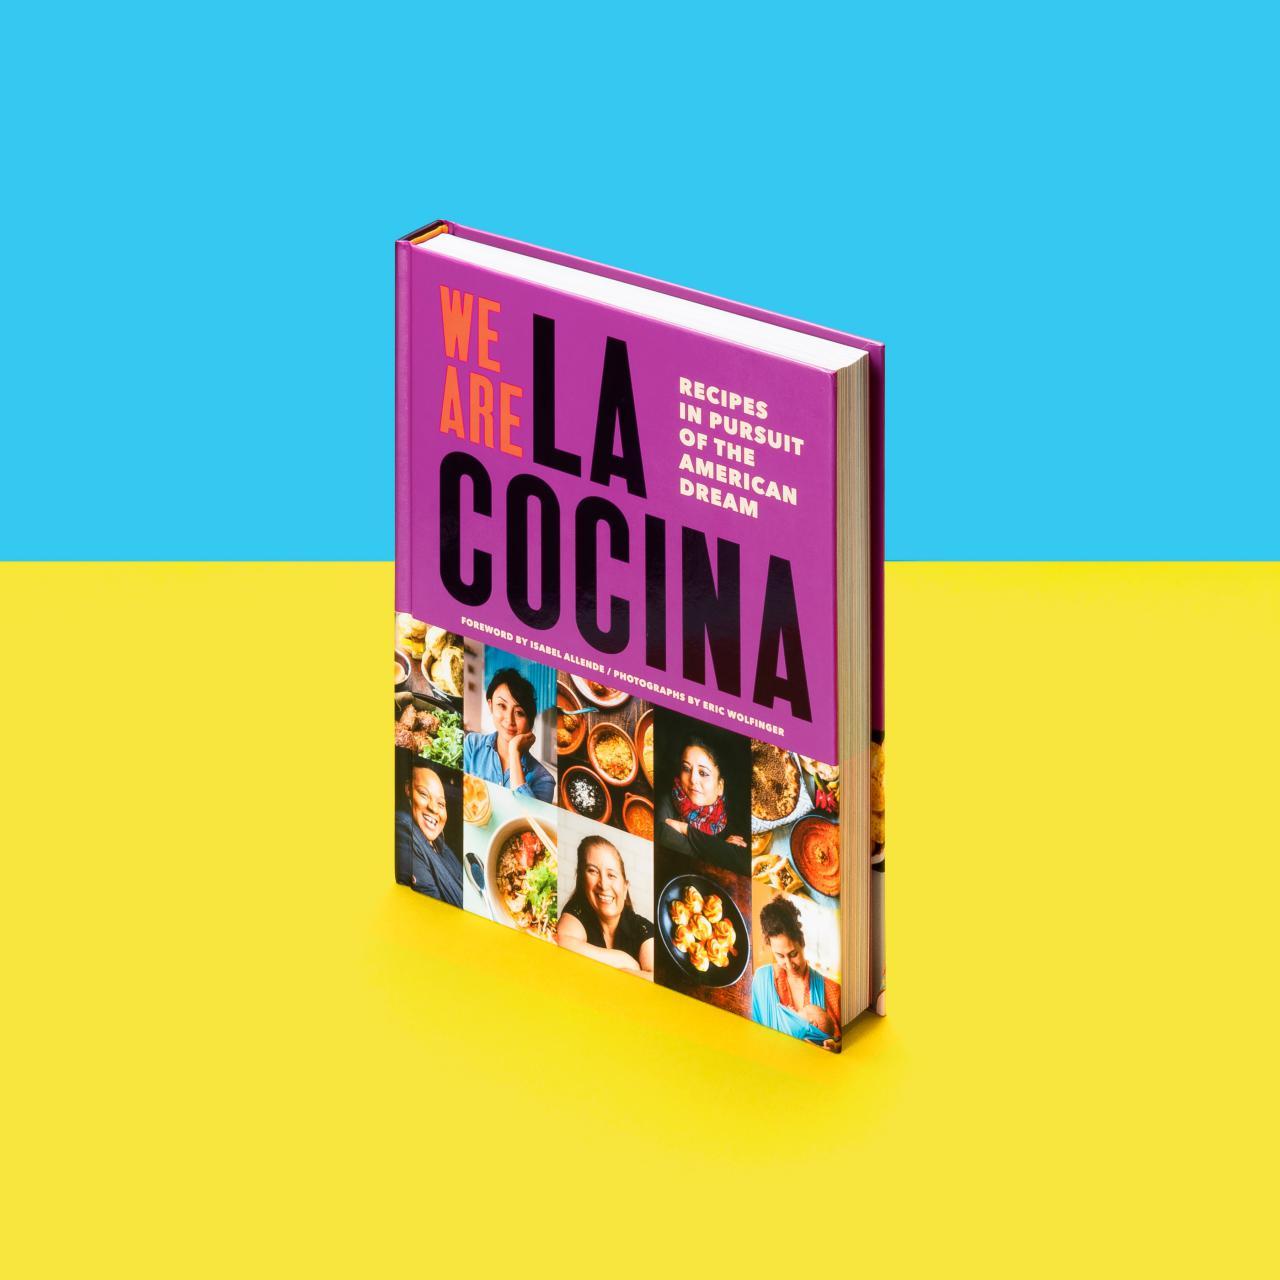 we-are-la-cocina-cookbook-book.jpg